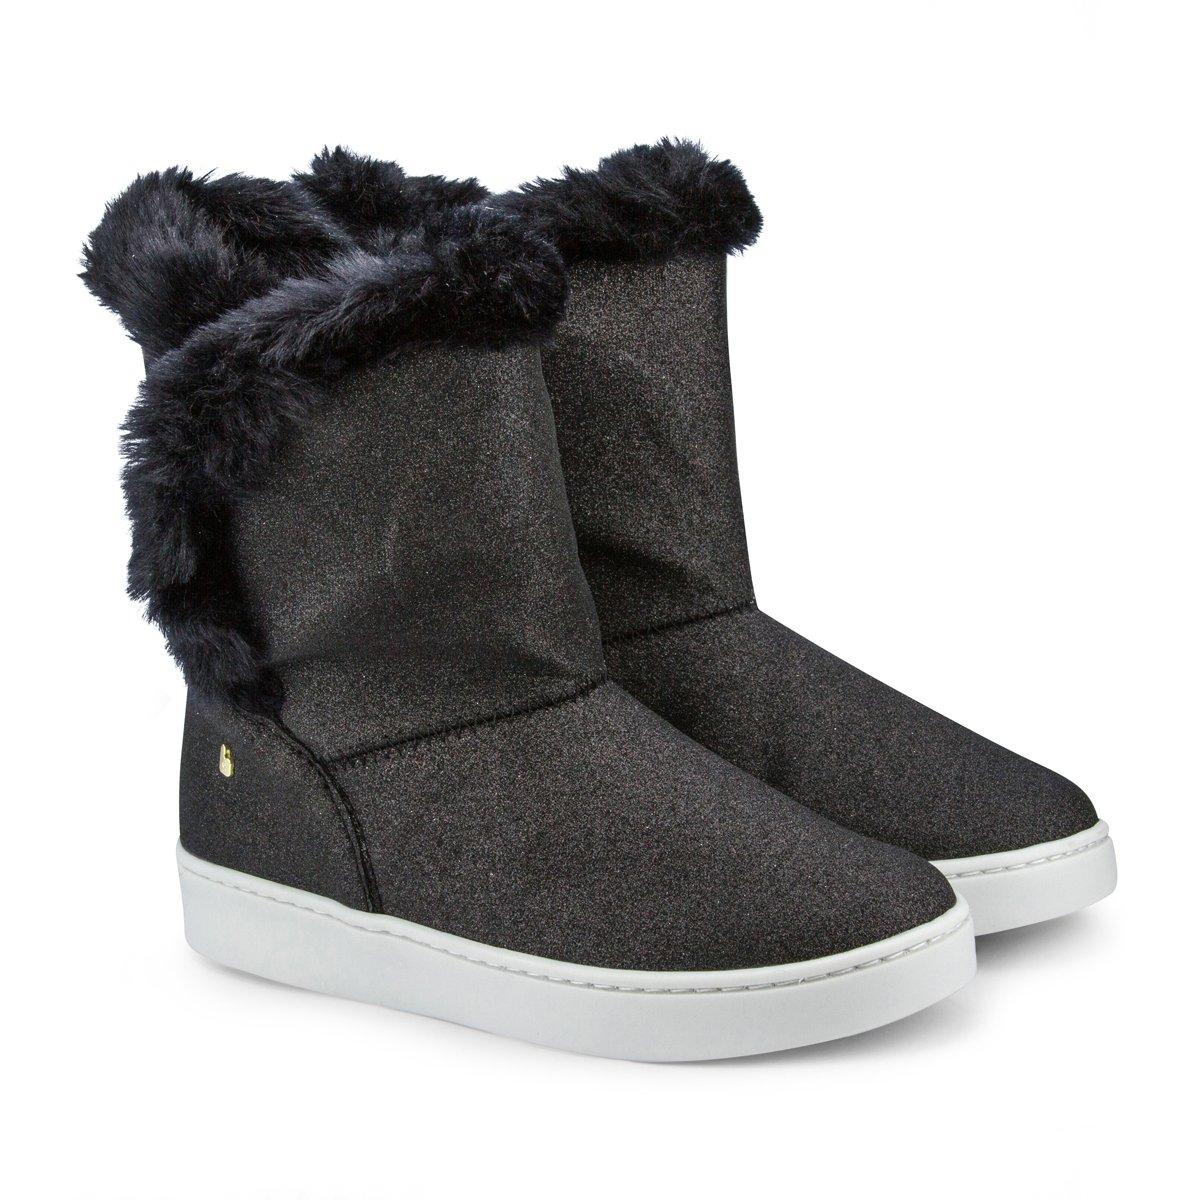 Cizme cu sclipici Bibi Shoes Urban Black